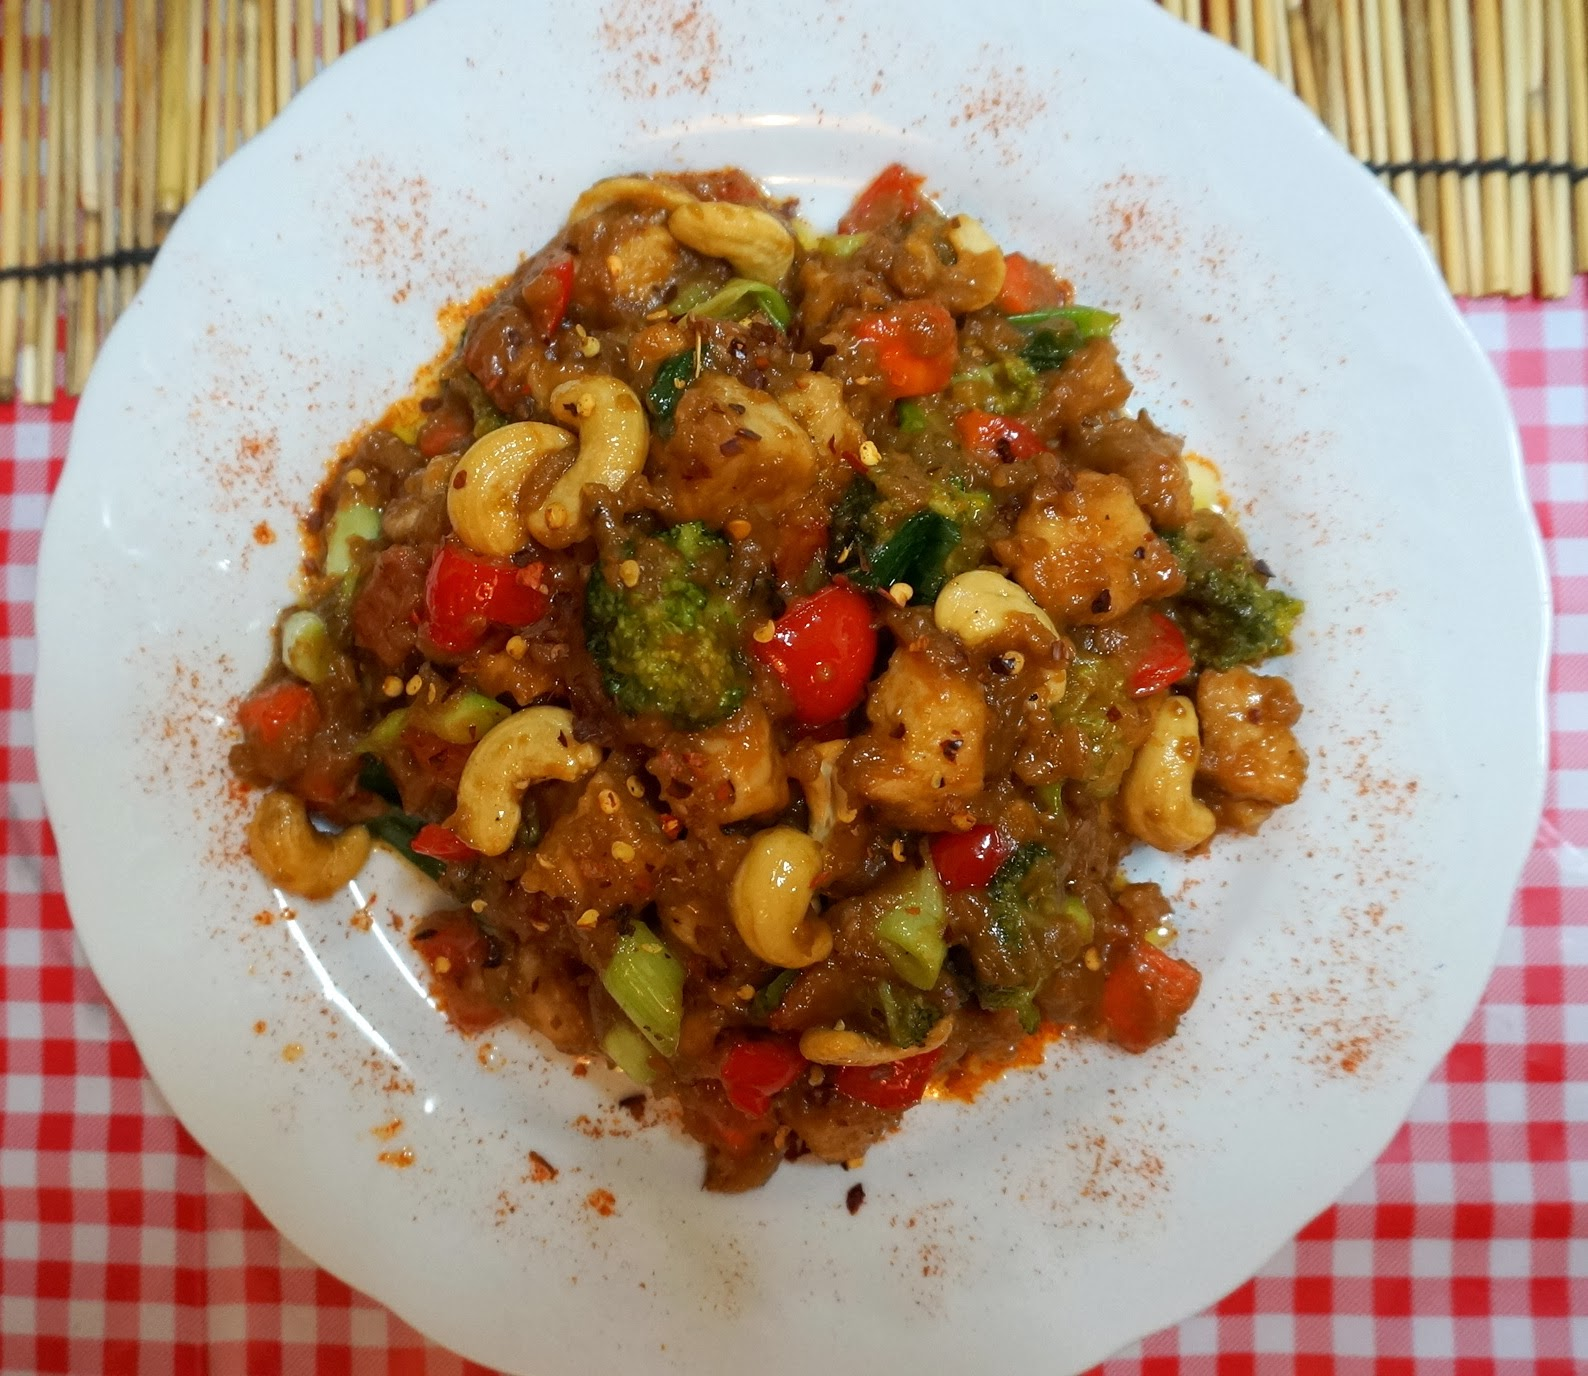 Recipe: Peanut Butter Chicken And Cashews Stir Fry